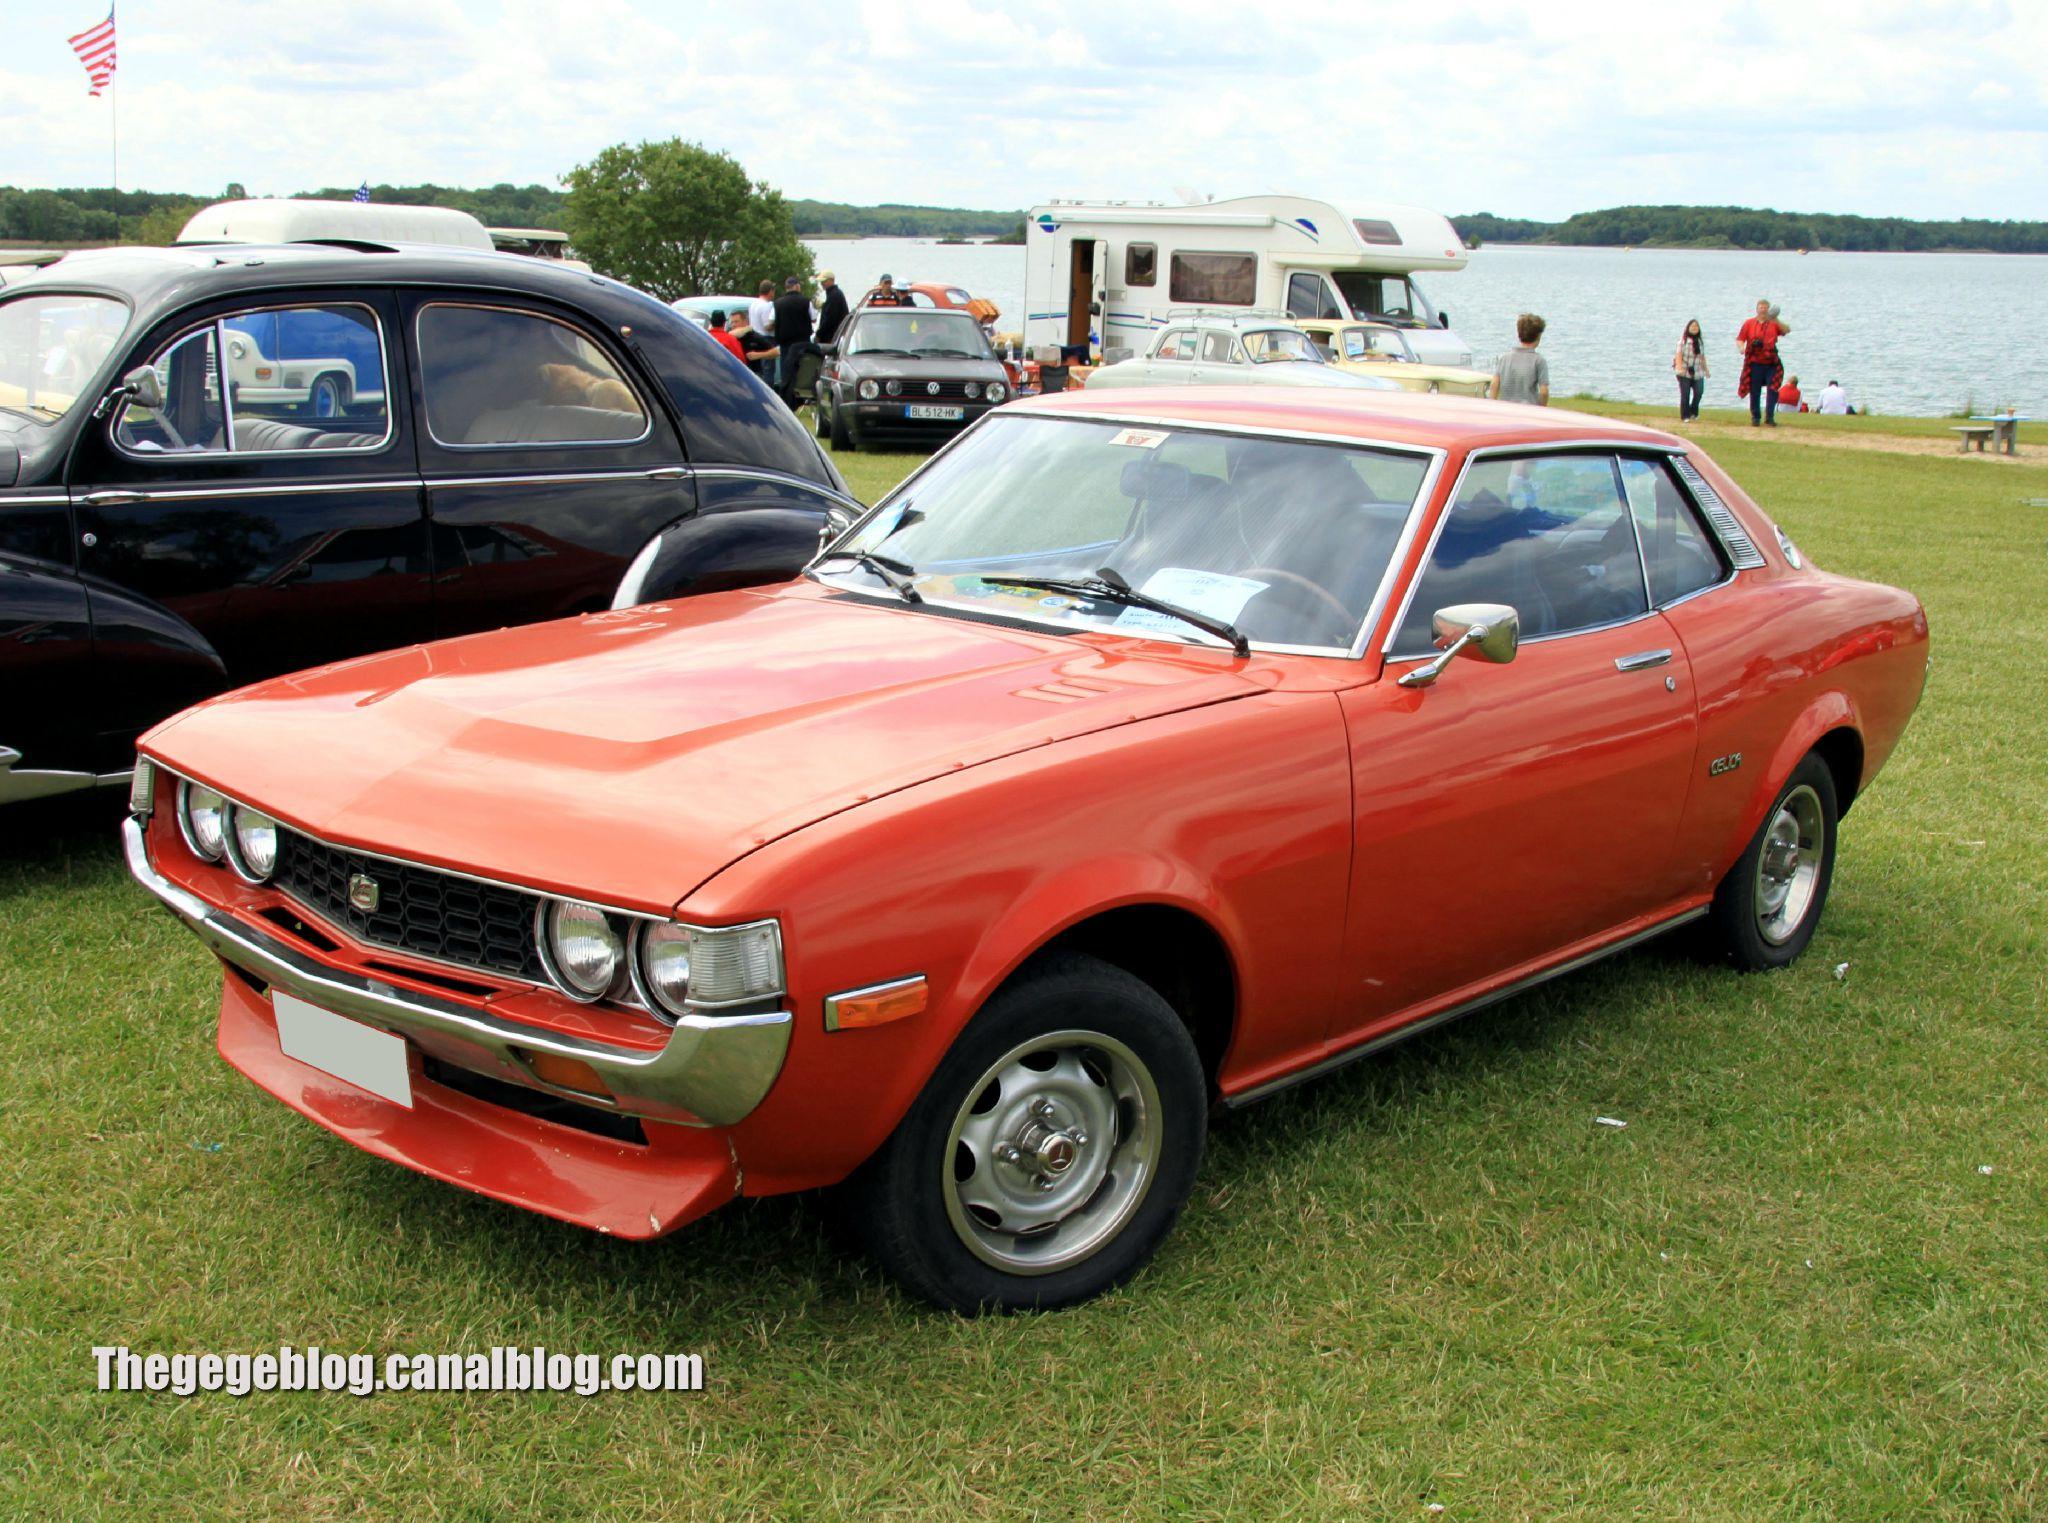 Toyota celica ST de 1976 (Retro Meus Auto Madine 2012) 01